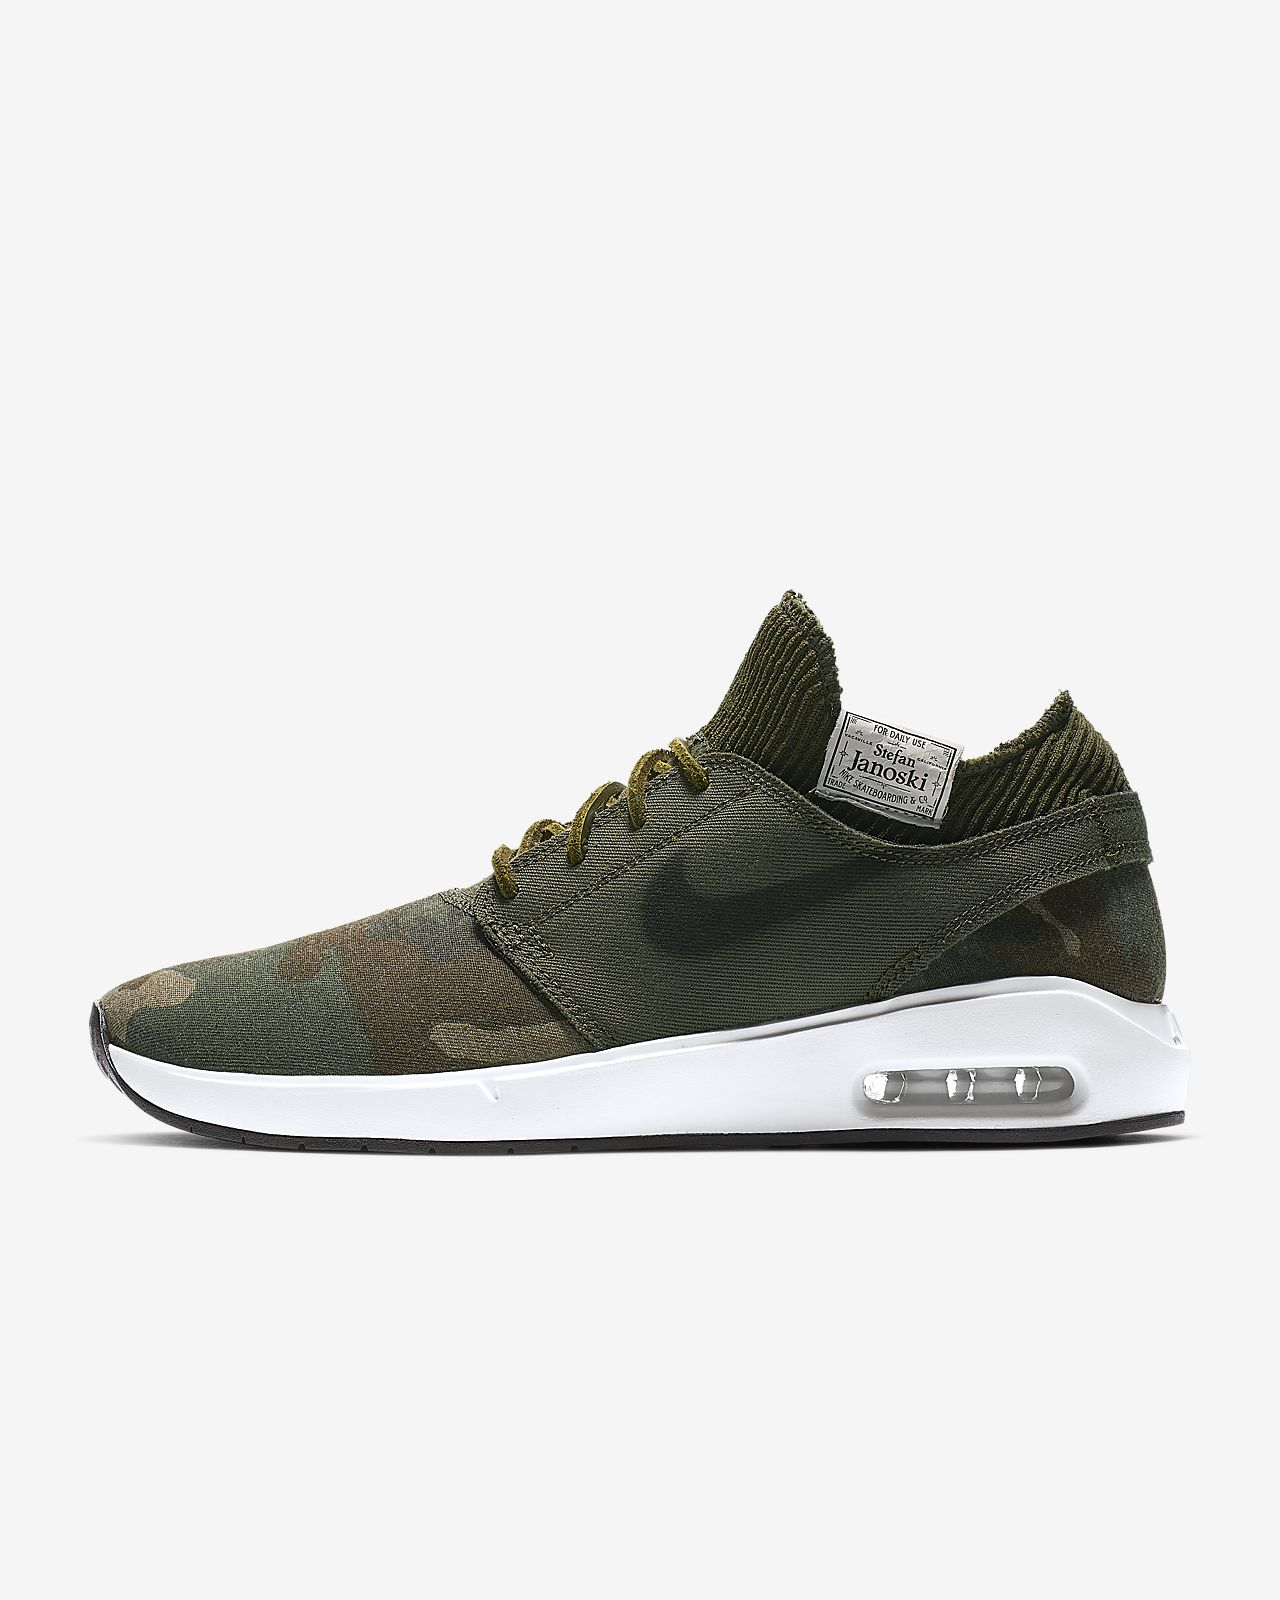 302c4eeface ... Nike SB Air Max Janoski 2 Premium Men s Skate Shoe